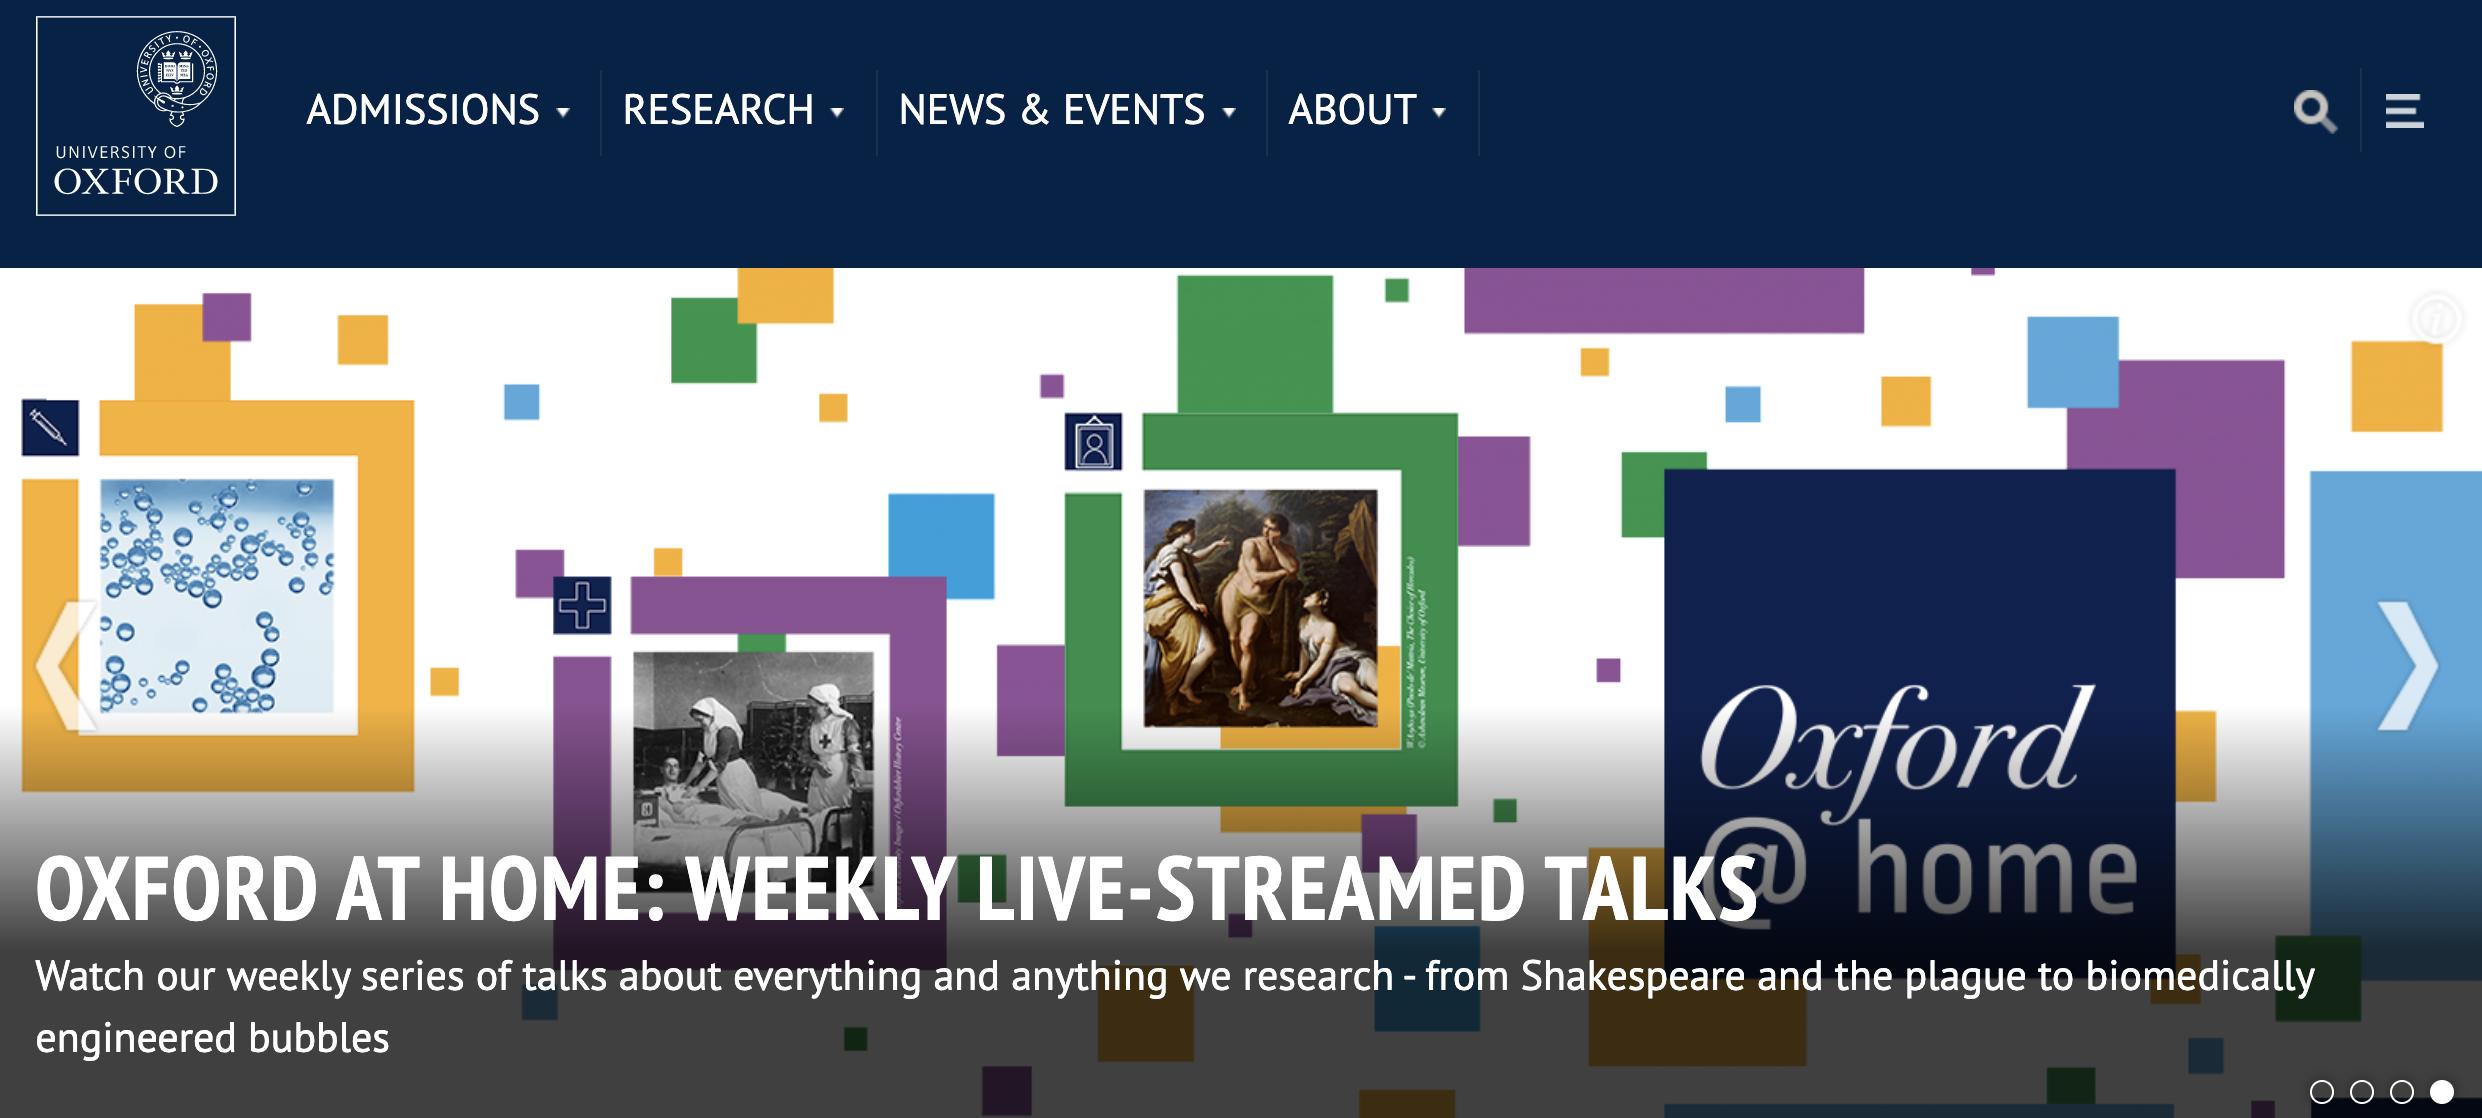 Oxford university website header